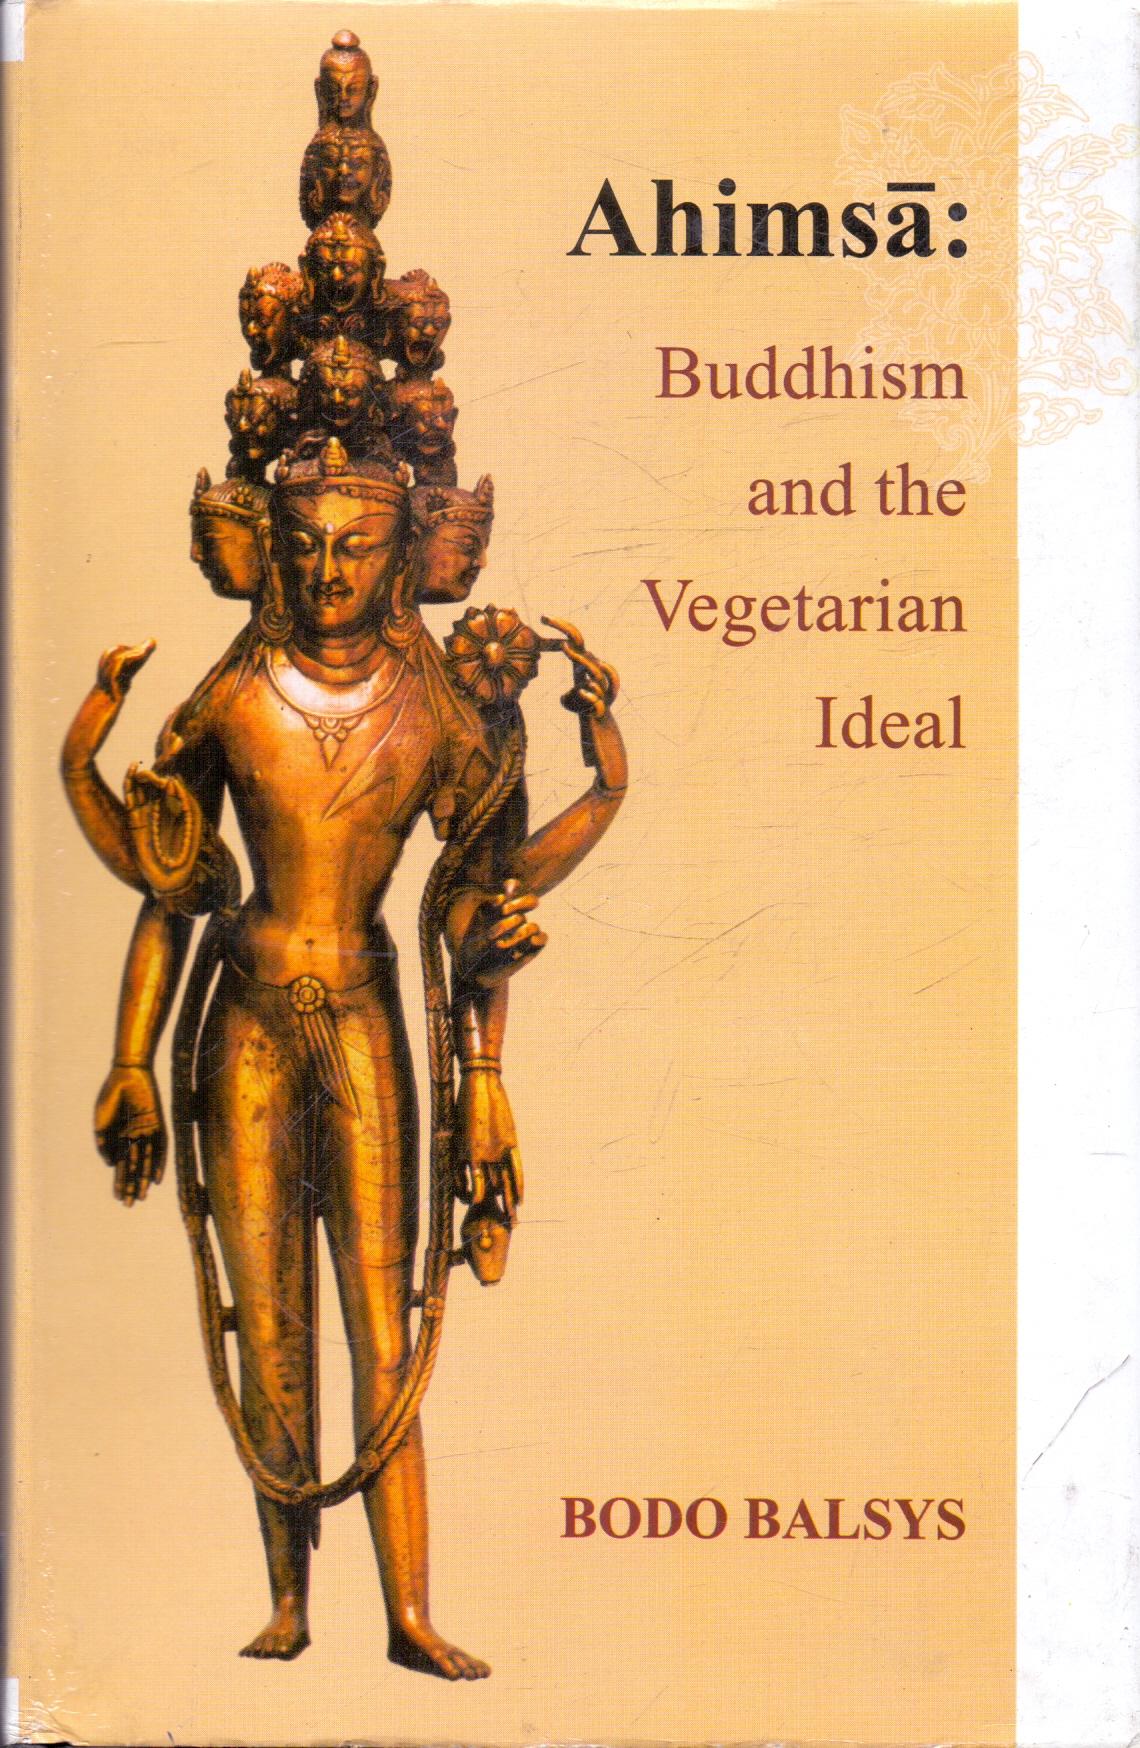 Ahimsa: Buddhism and the Vegetarian Ideal